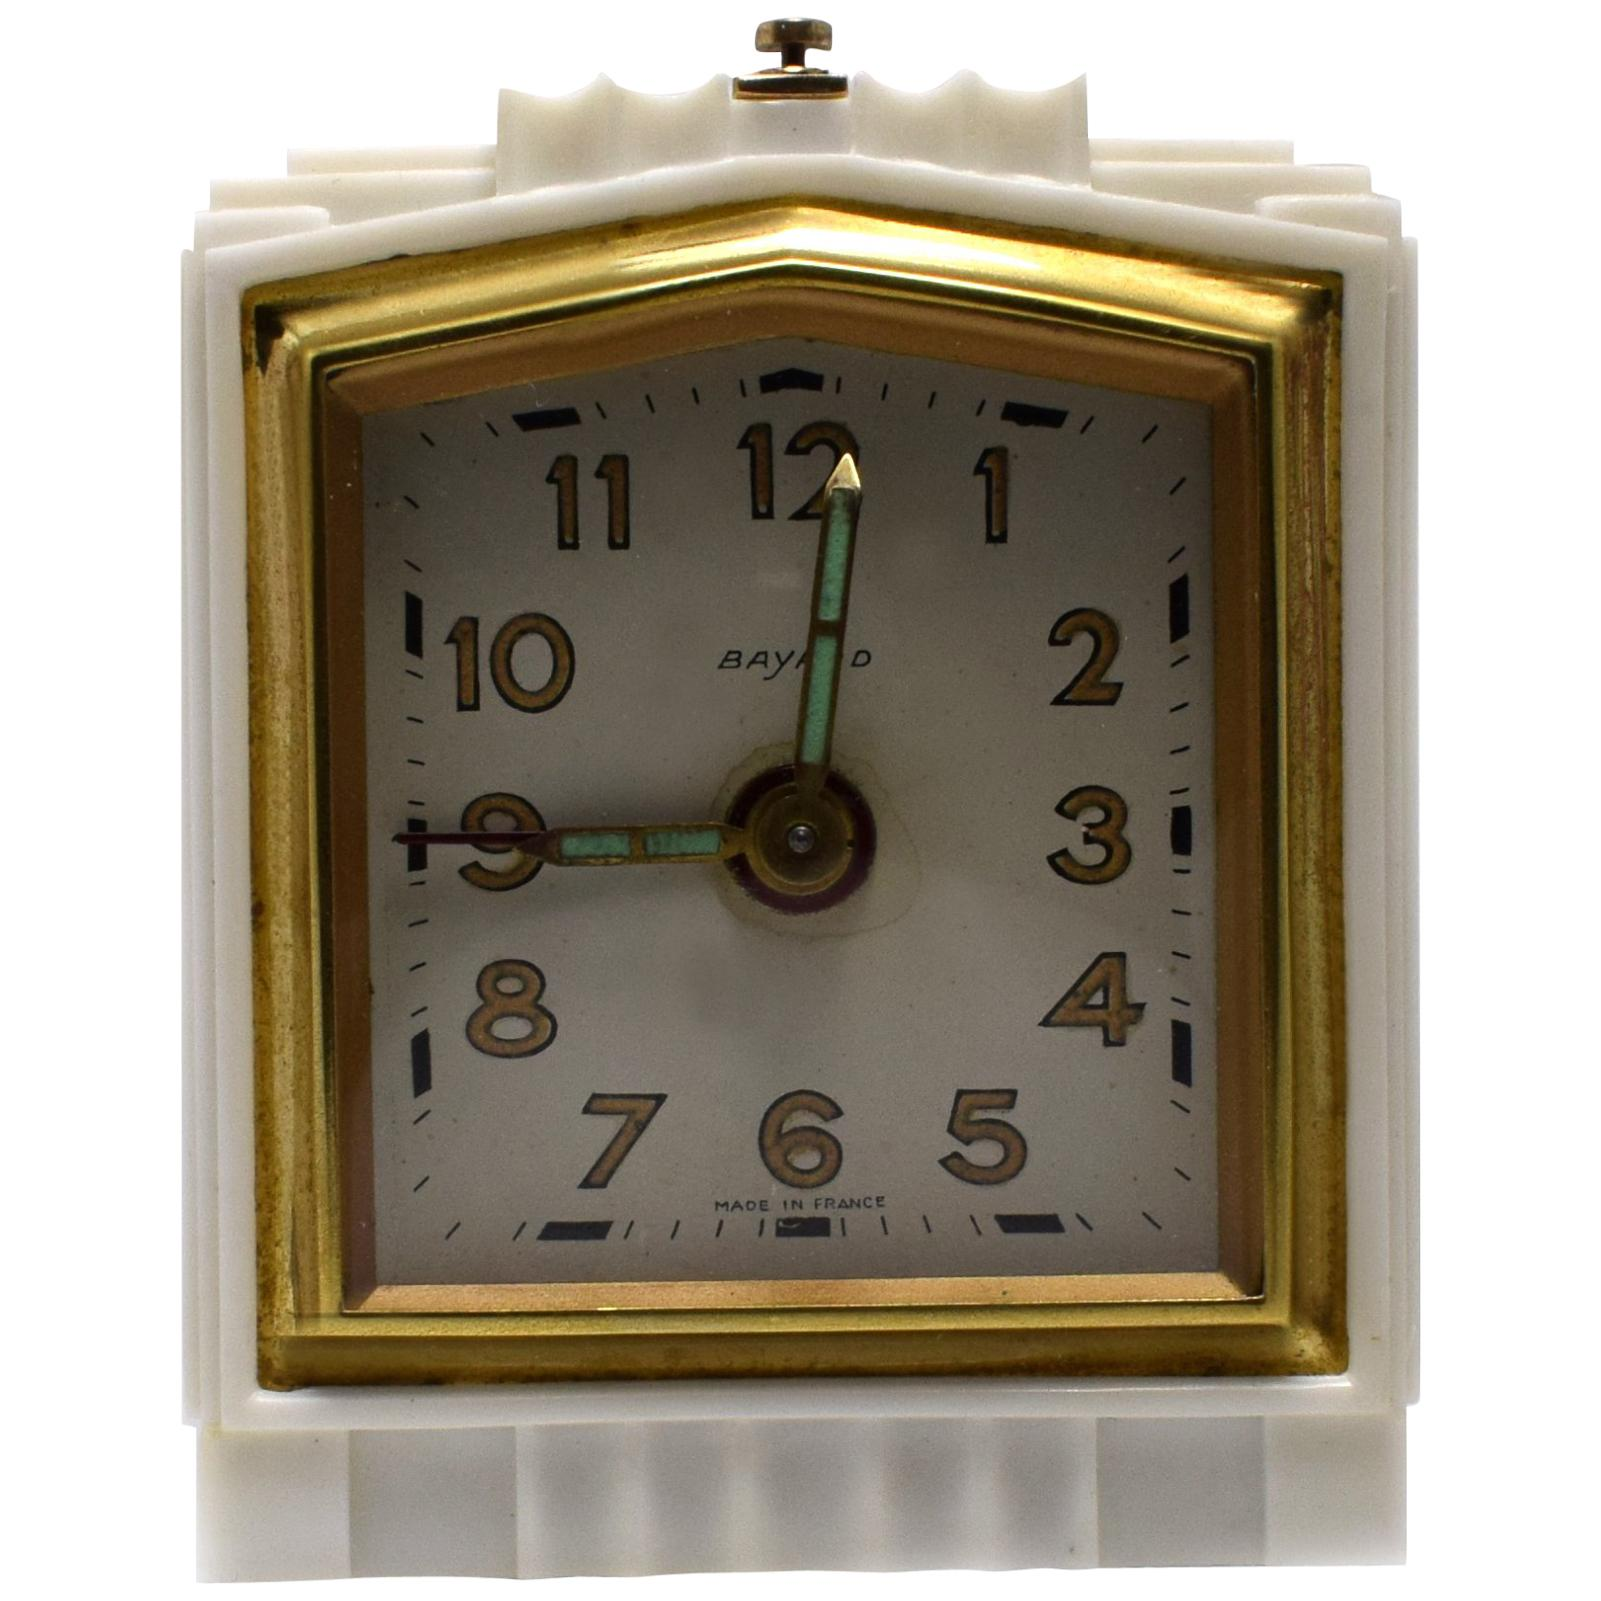 Art Deco 1930s French Bakelite Miniature Alarm Clock